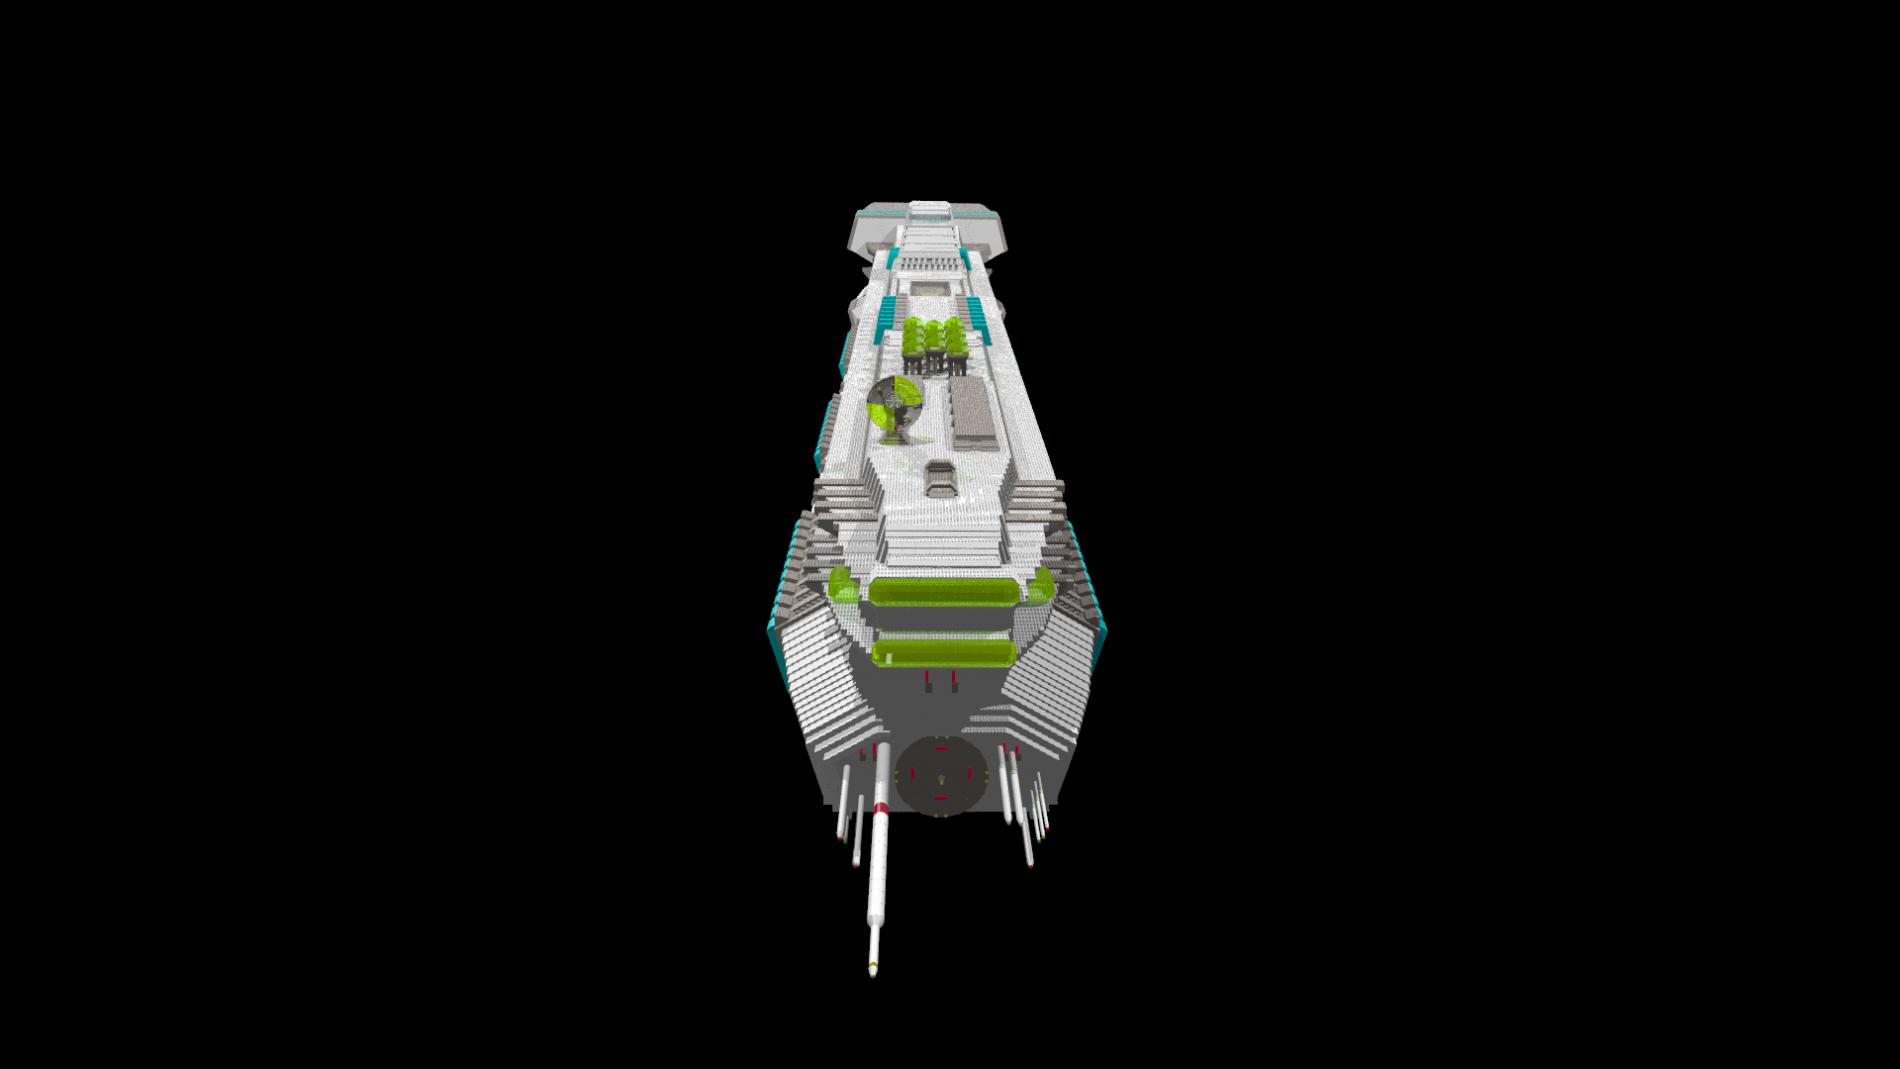 L.M.S. Explorer HD render 3